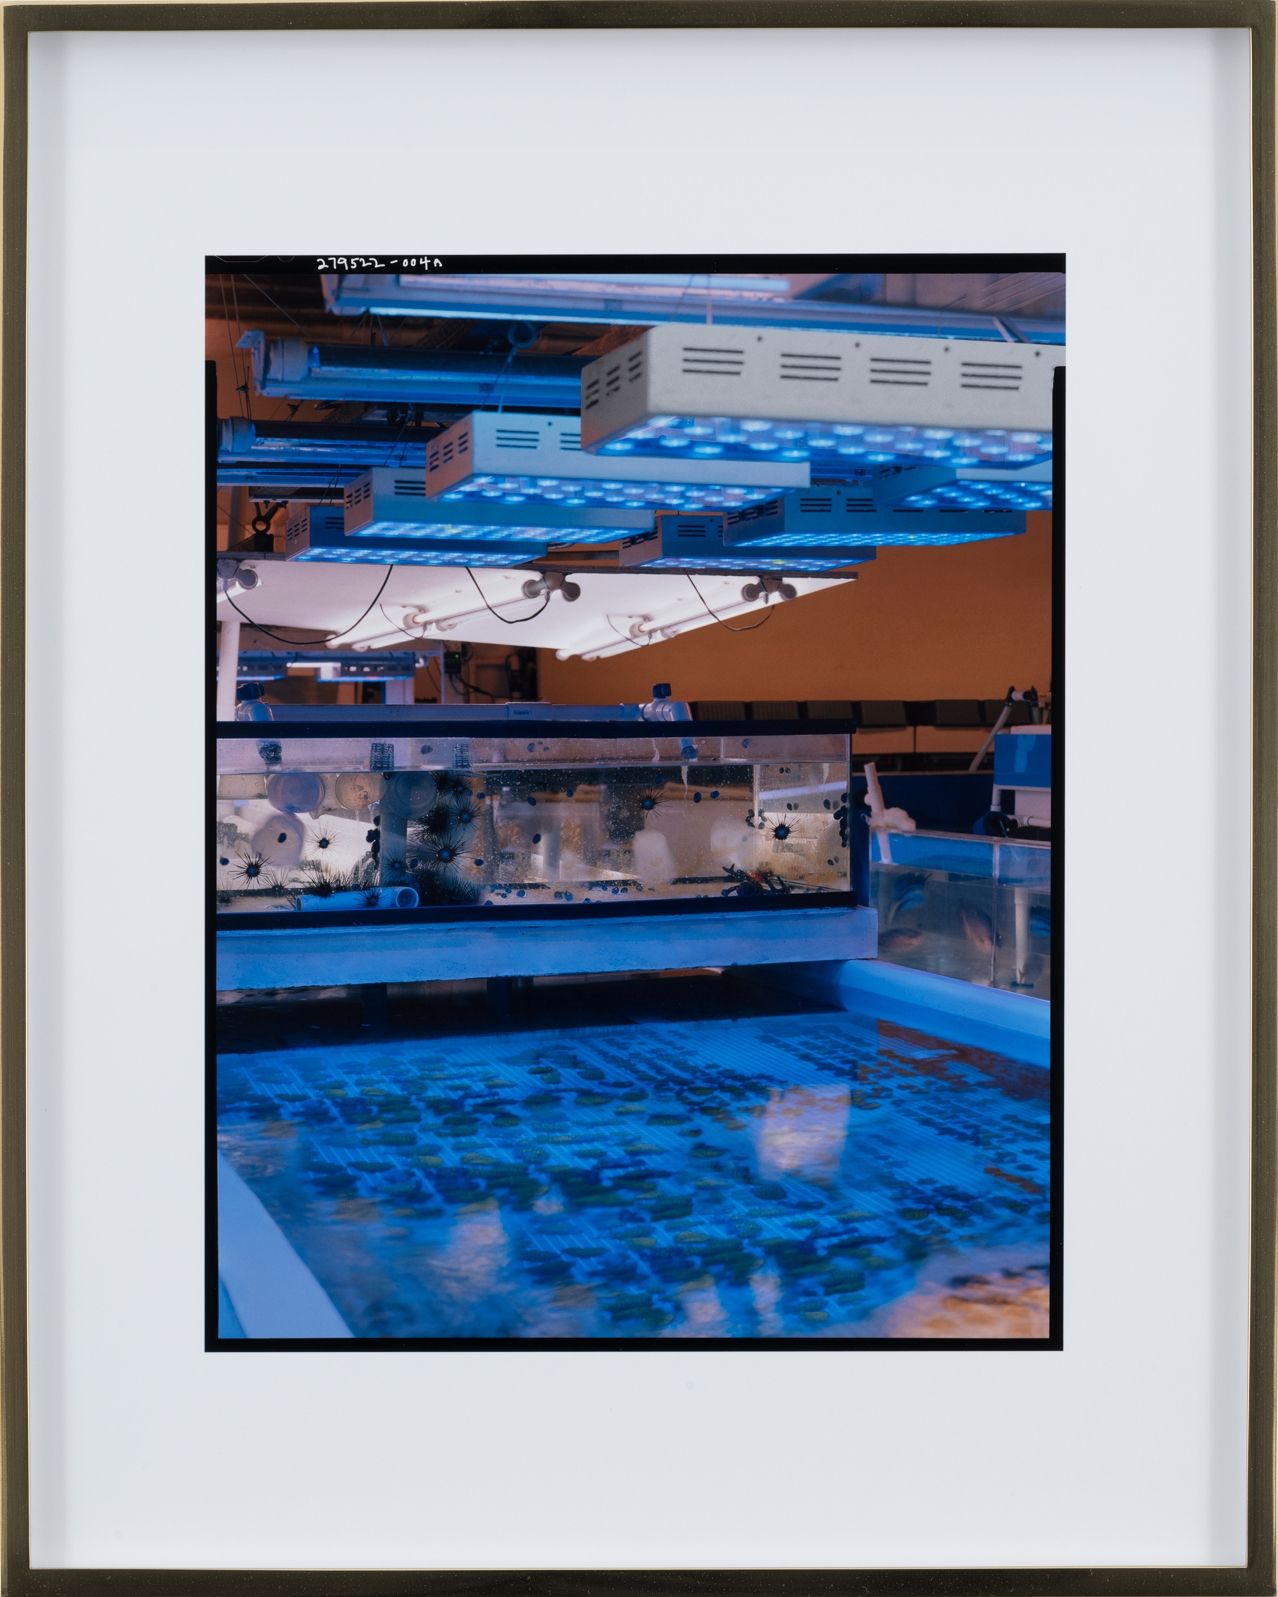 Elad Lassry, Untitled (Facility A), 2018